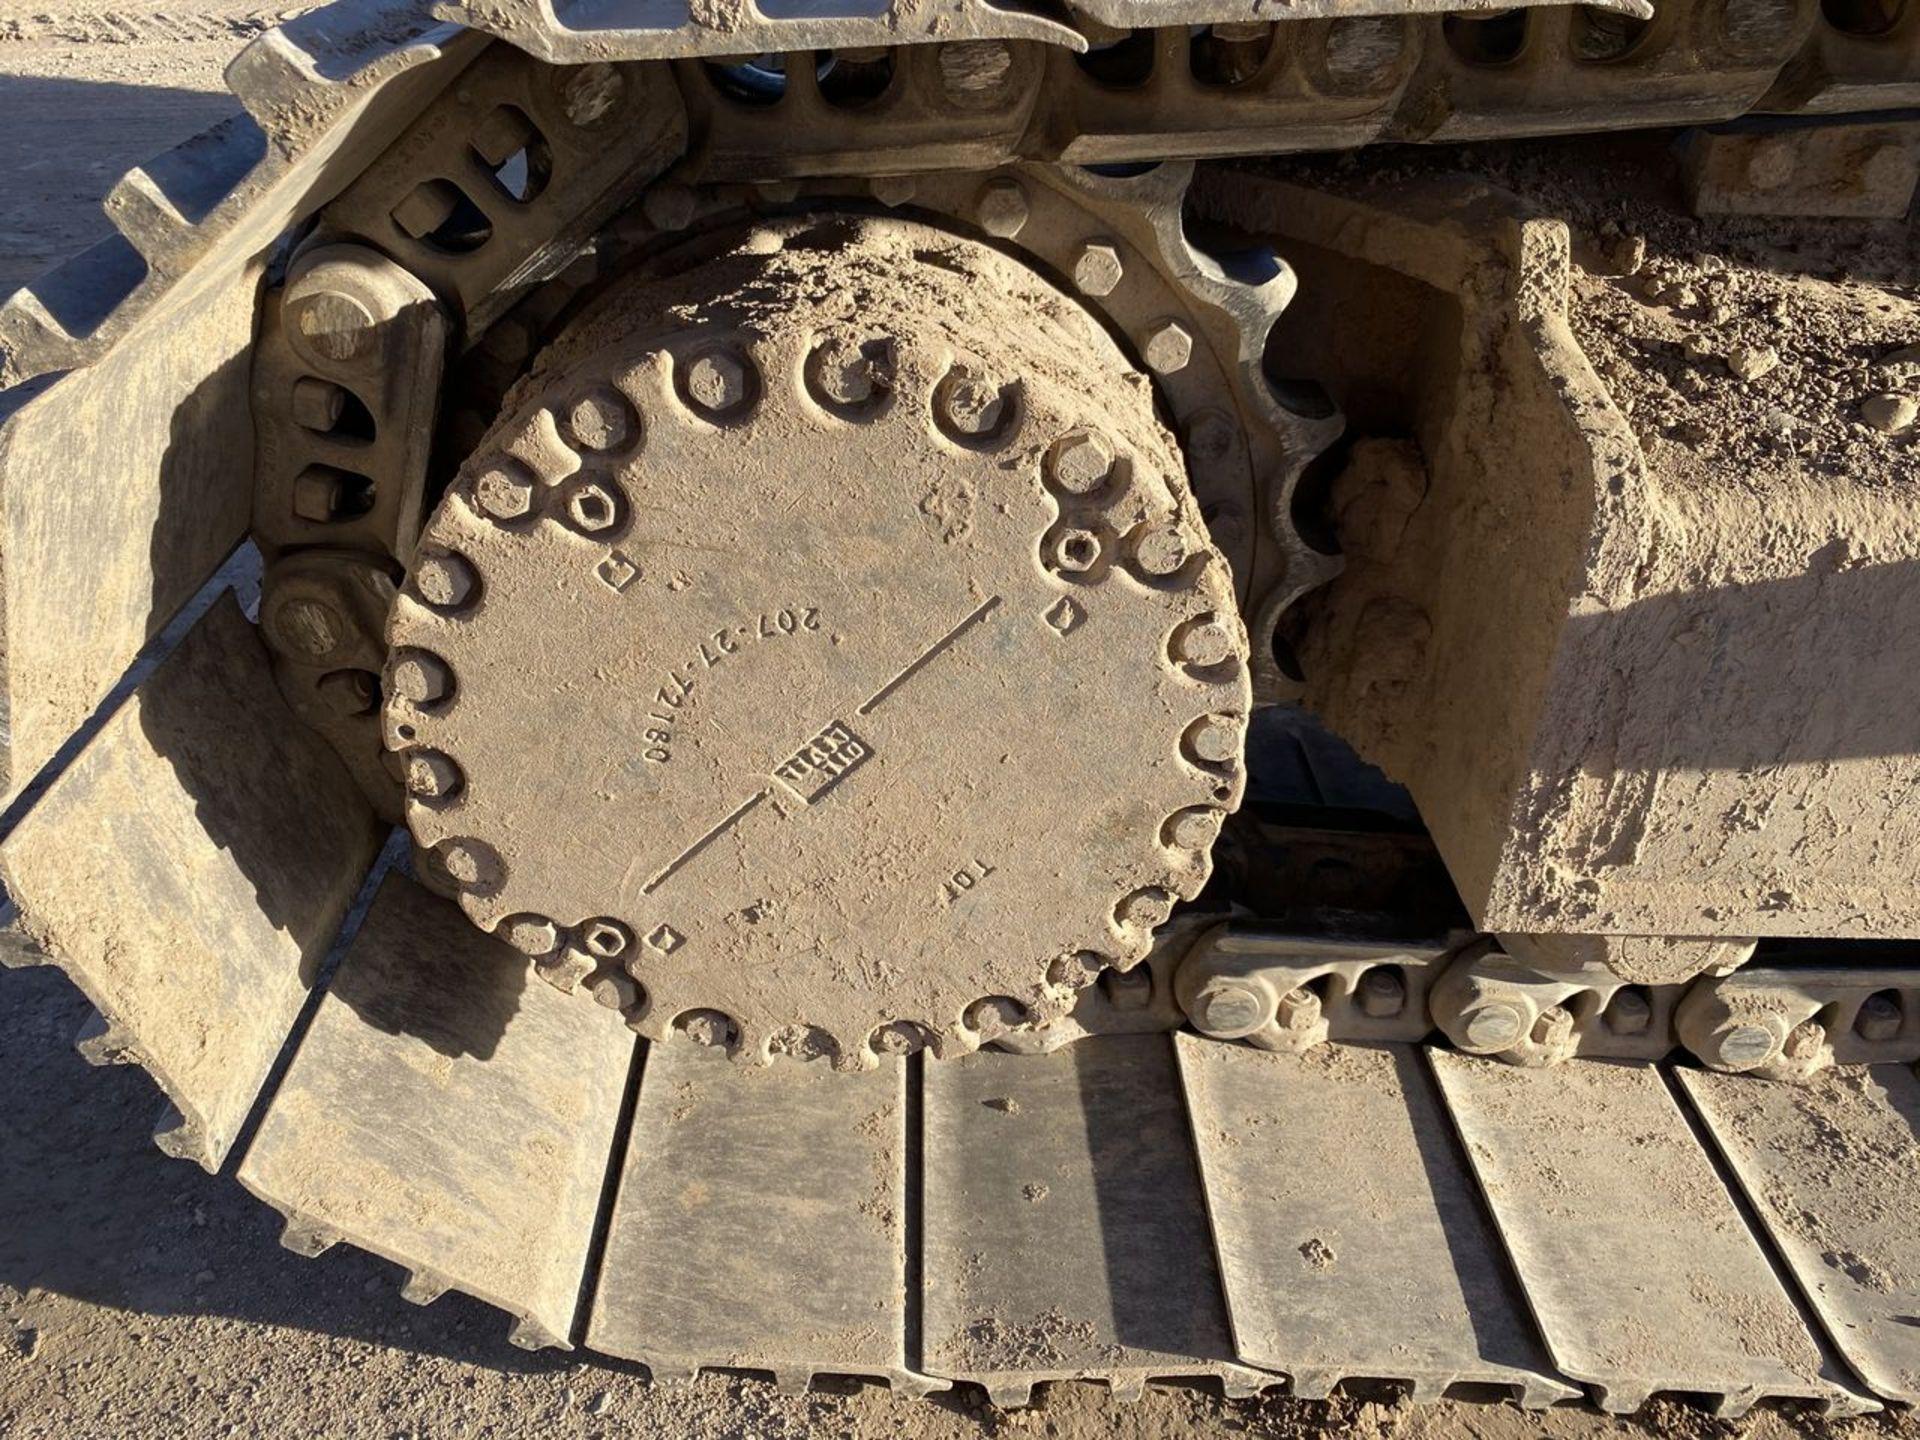 2018 Komatsu PC360LC-11 Hydraulic Crawler Excavator, S/N: A36863, PIN: KMTPC256CJWA36863; with 2,883 - Image 17 of 19